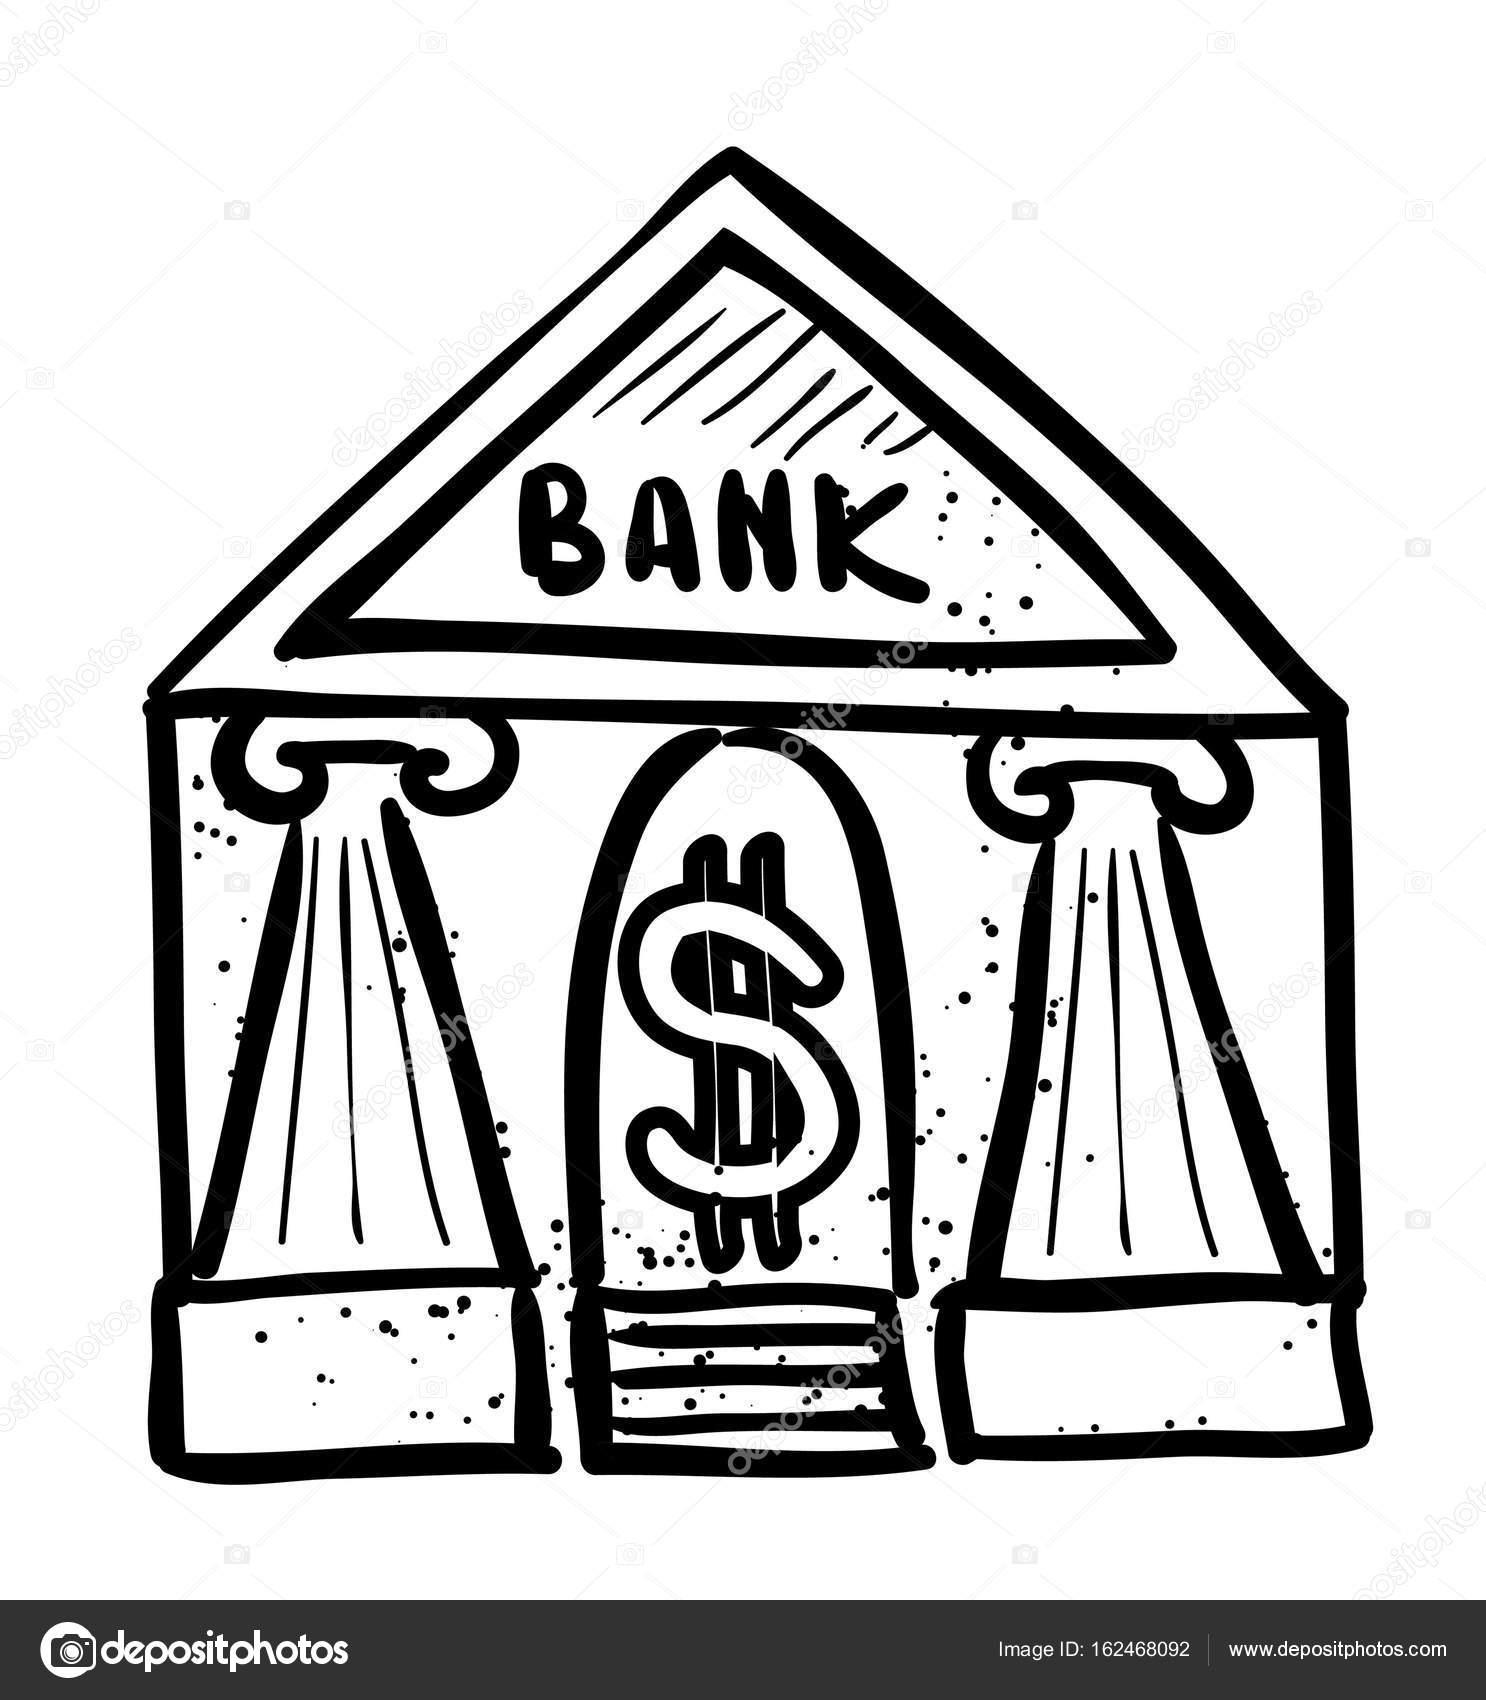 Cartoon image of bank icon government symbol stock vector cartoon image of bank icon government symbol stock vector biocorpaavc Gallery